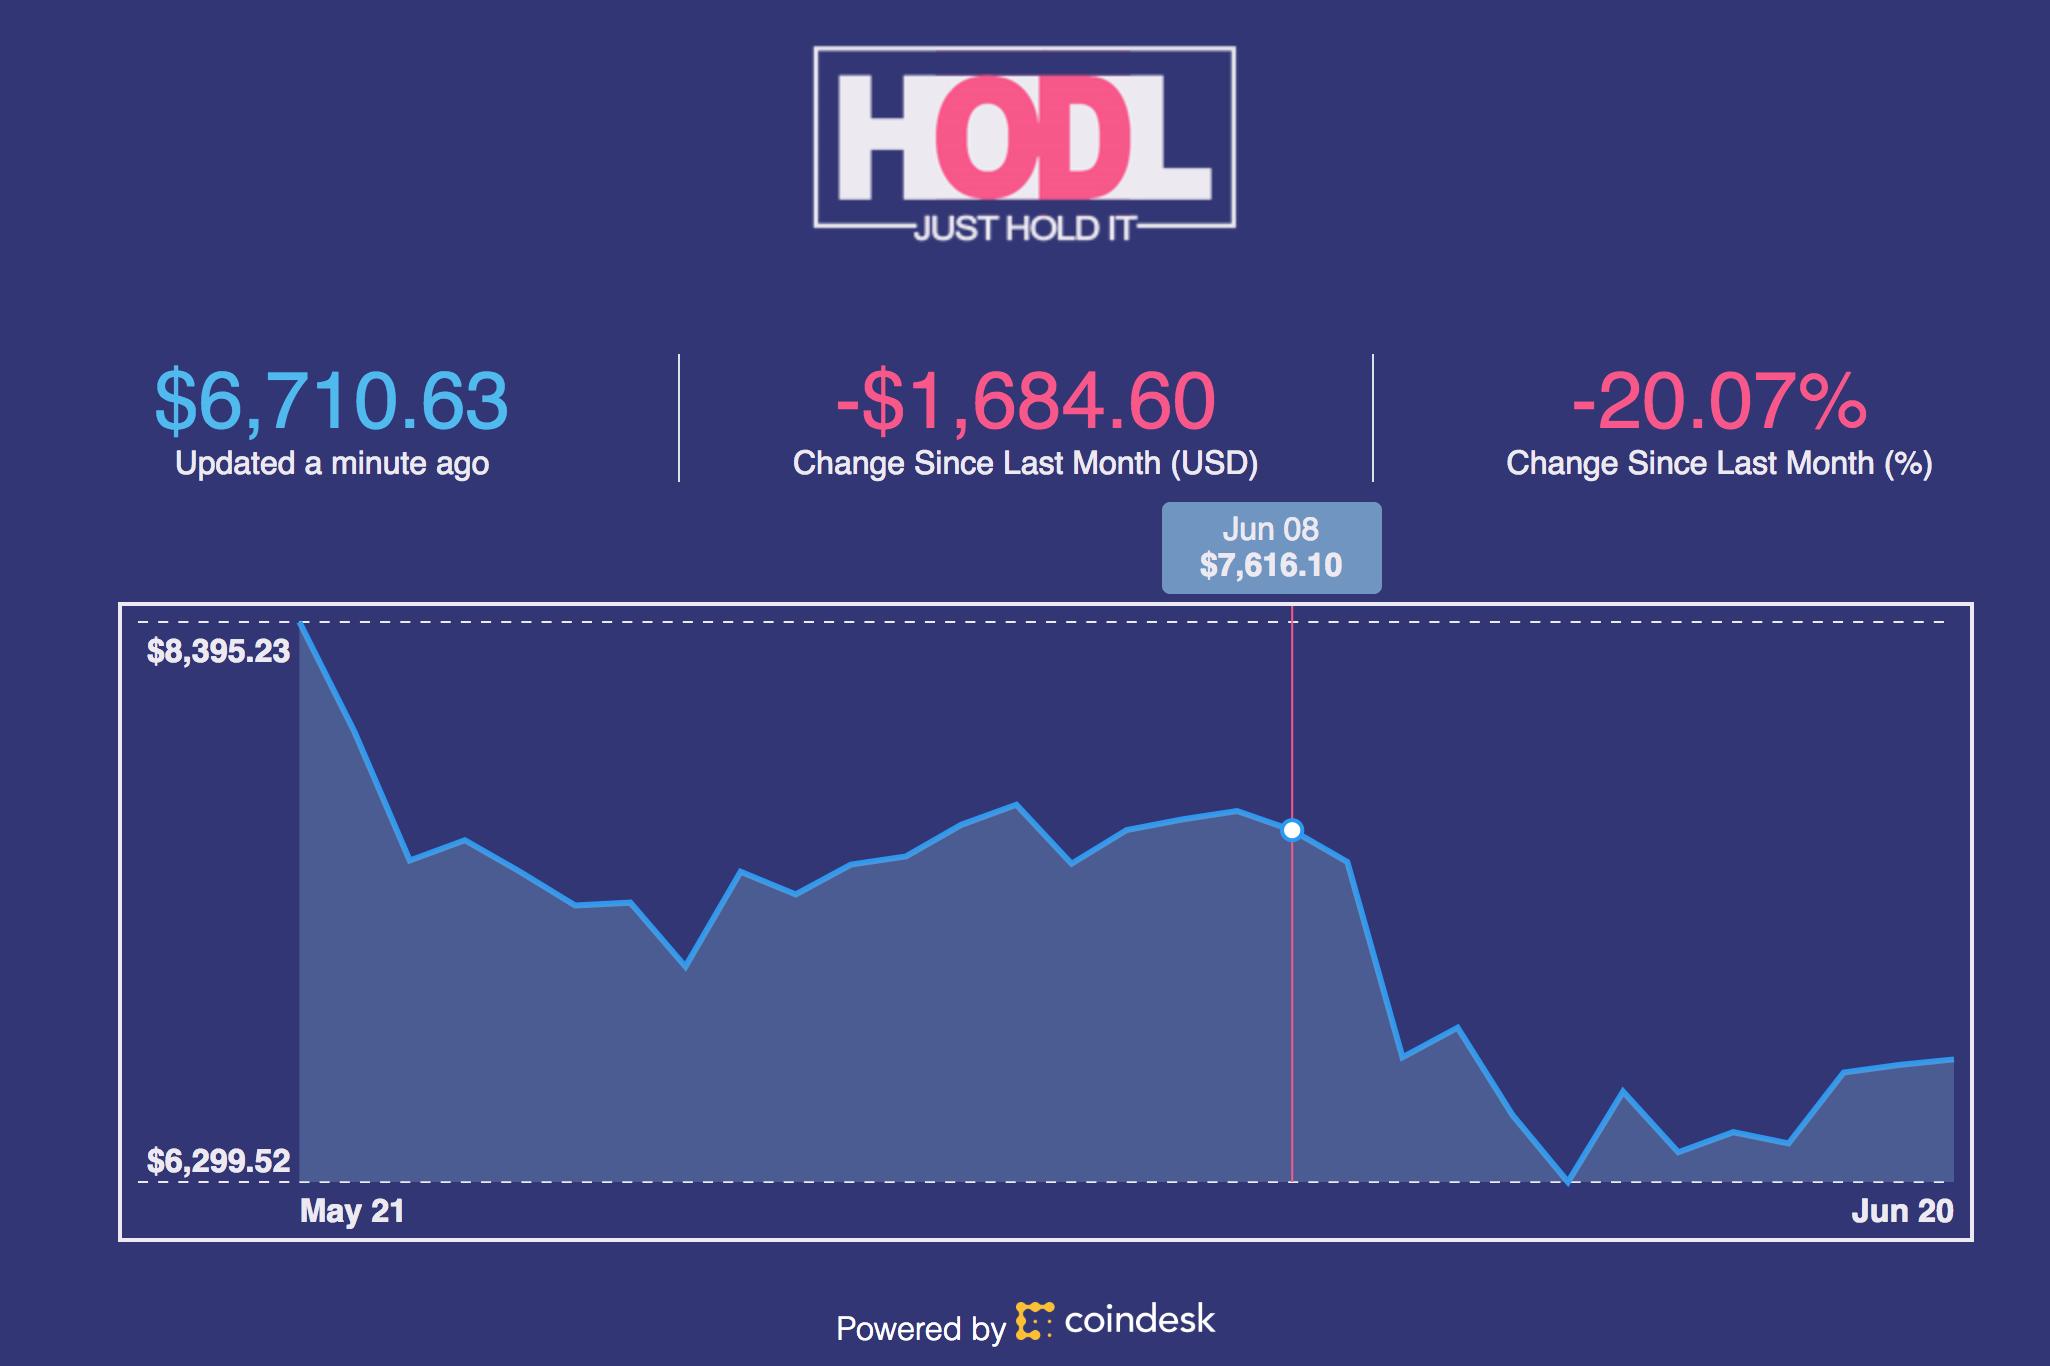 HODL Bitcoin Monitor